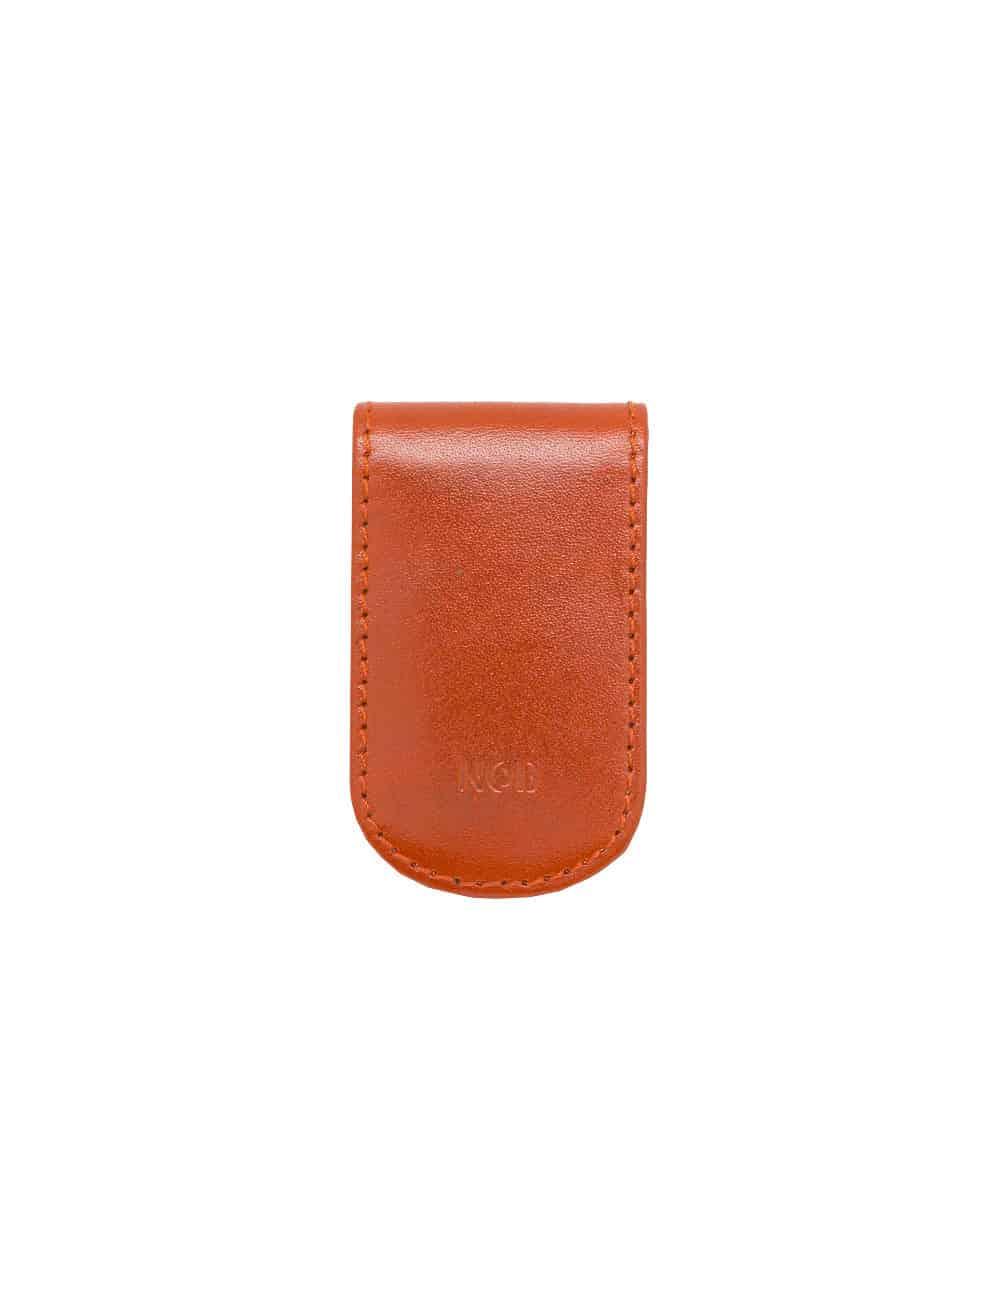 Orange 100% Genuine Top Grain Leather Money Clip SLG3.NOB1